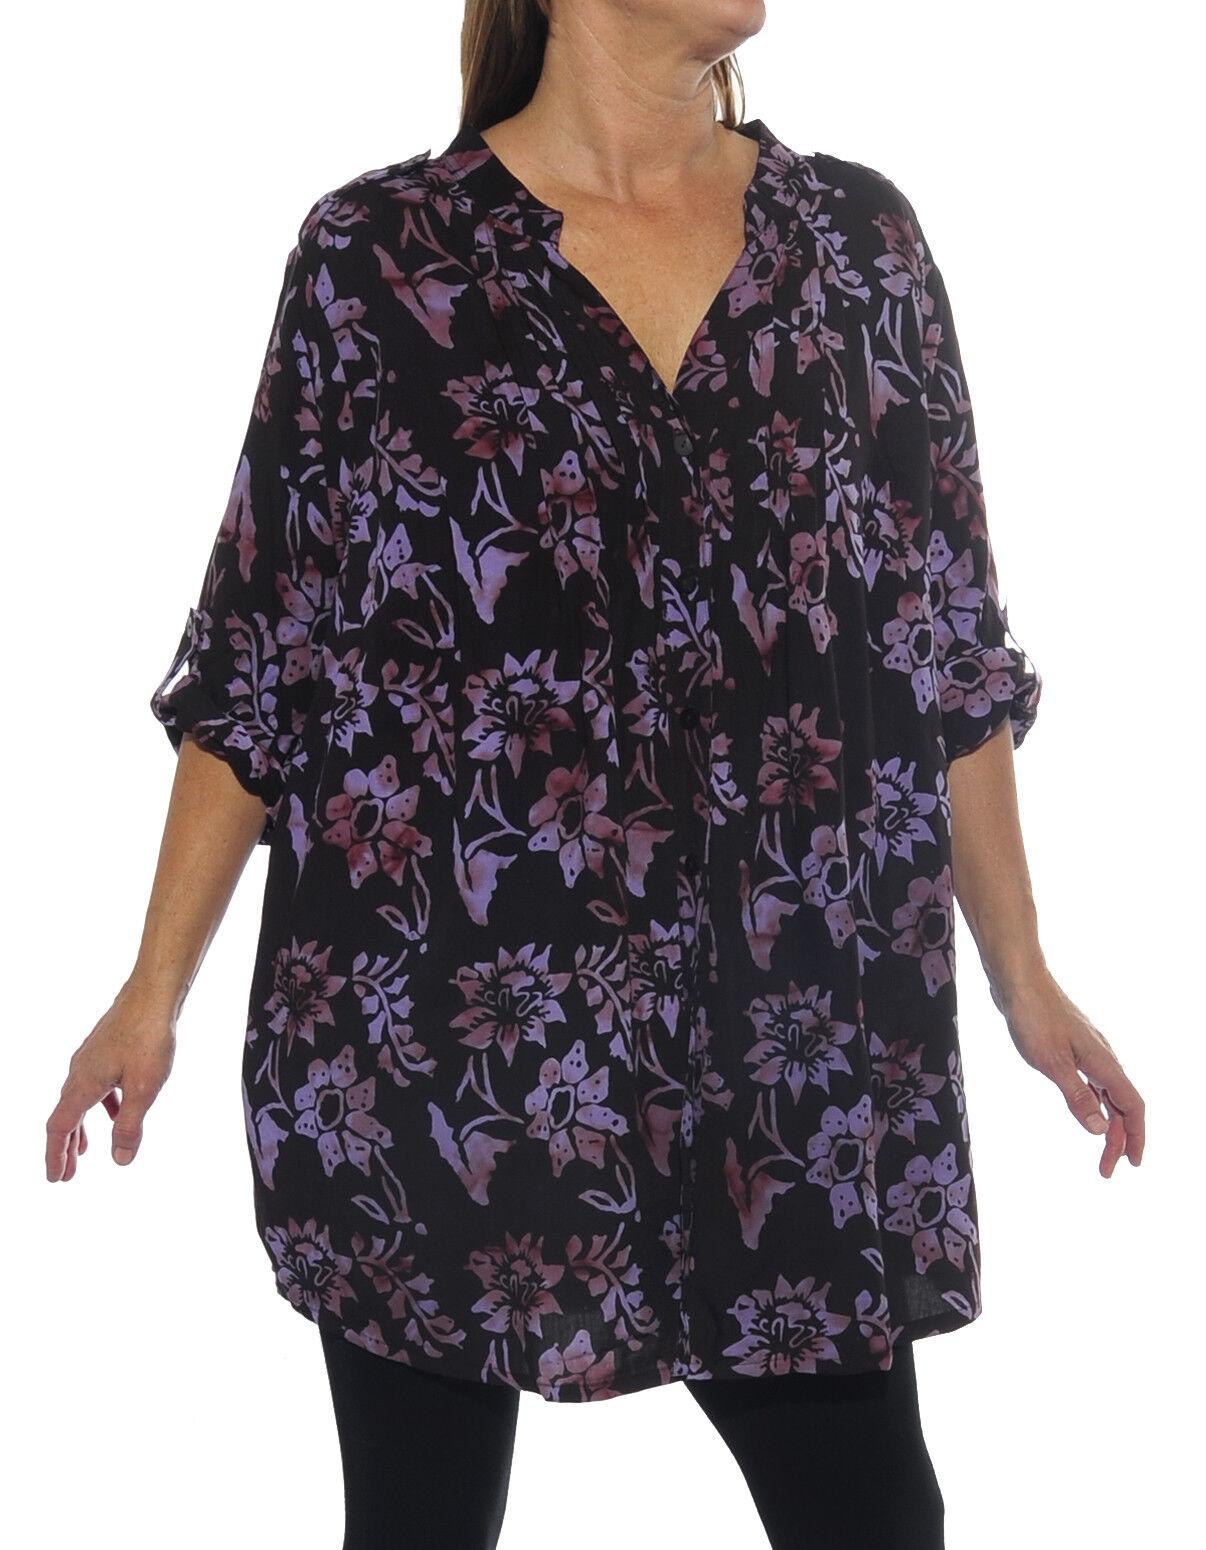 We Be Bop Women's Plus Size Starry Flower Purple Katherine Blouse 0X-6X